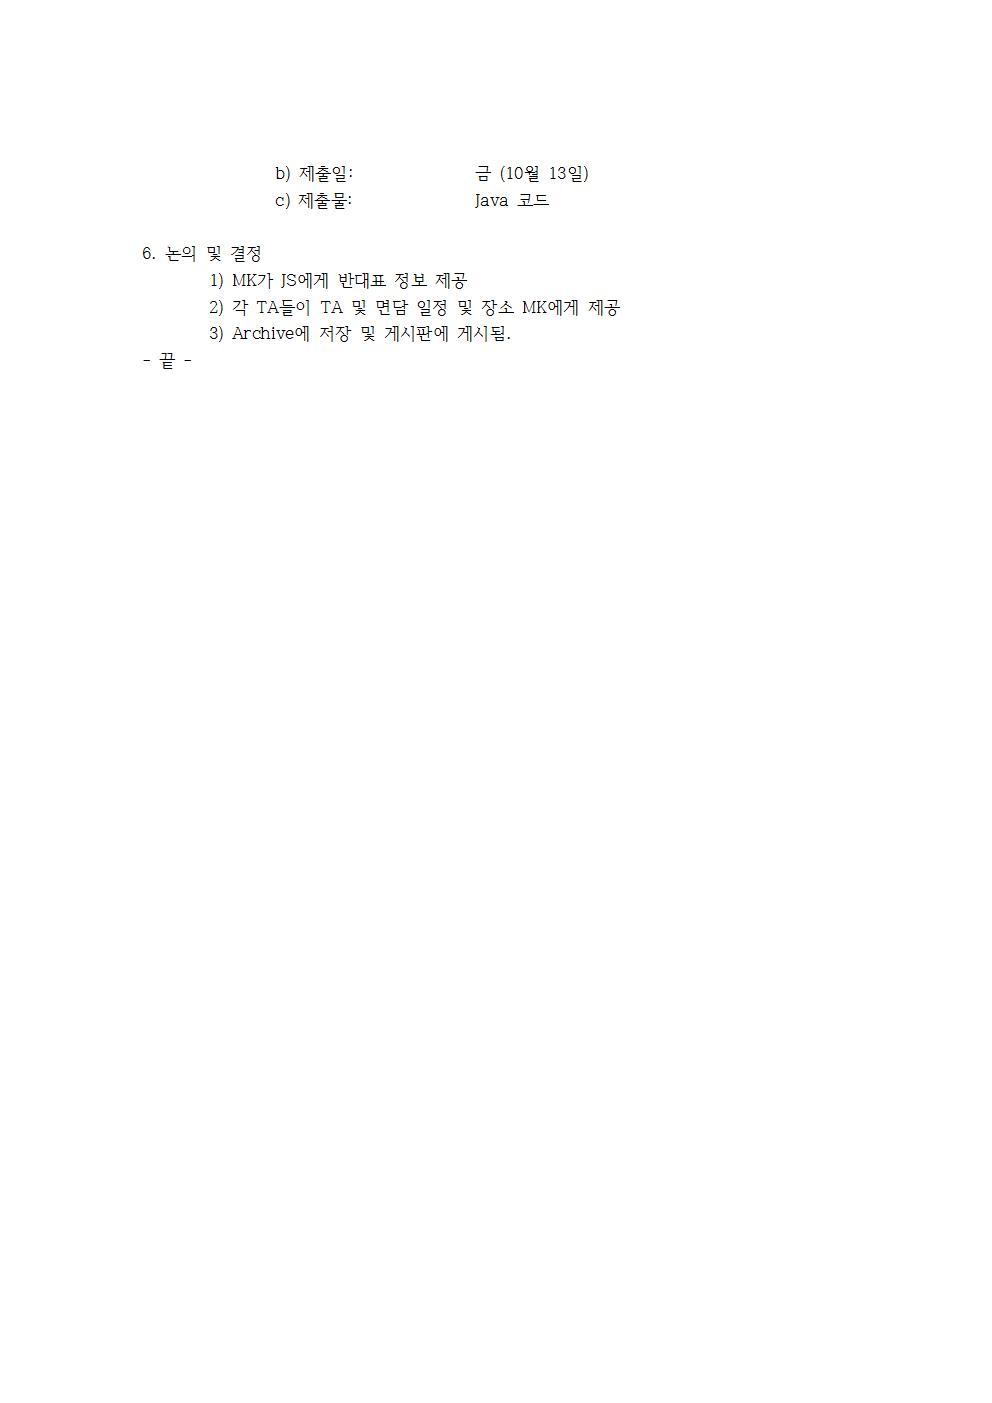 D-[17-090-LC-02]-[SE]-2017-09-25002.jpg